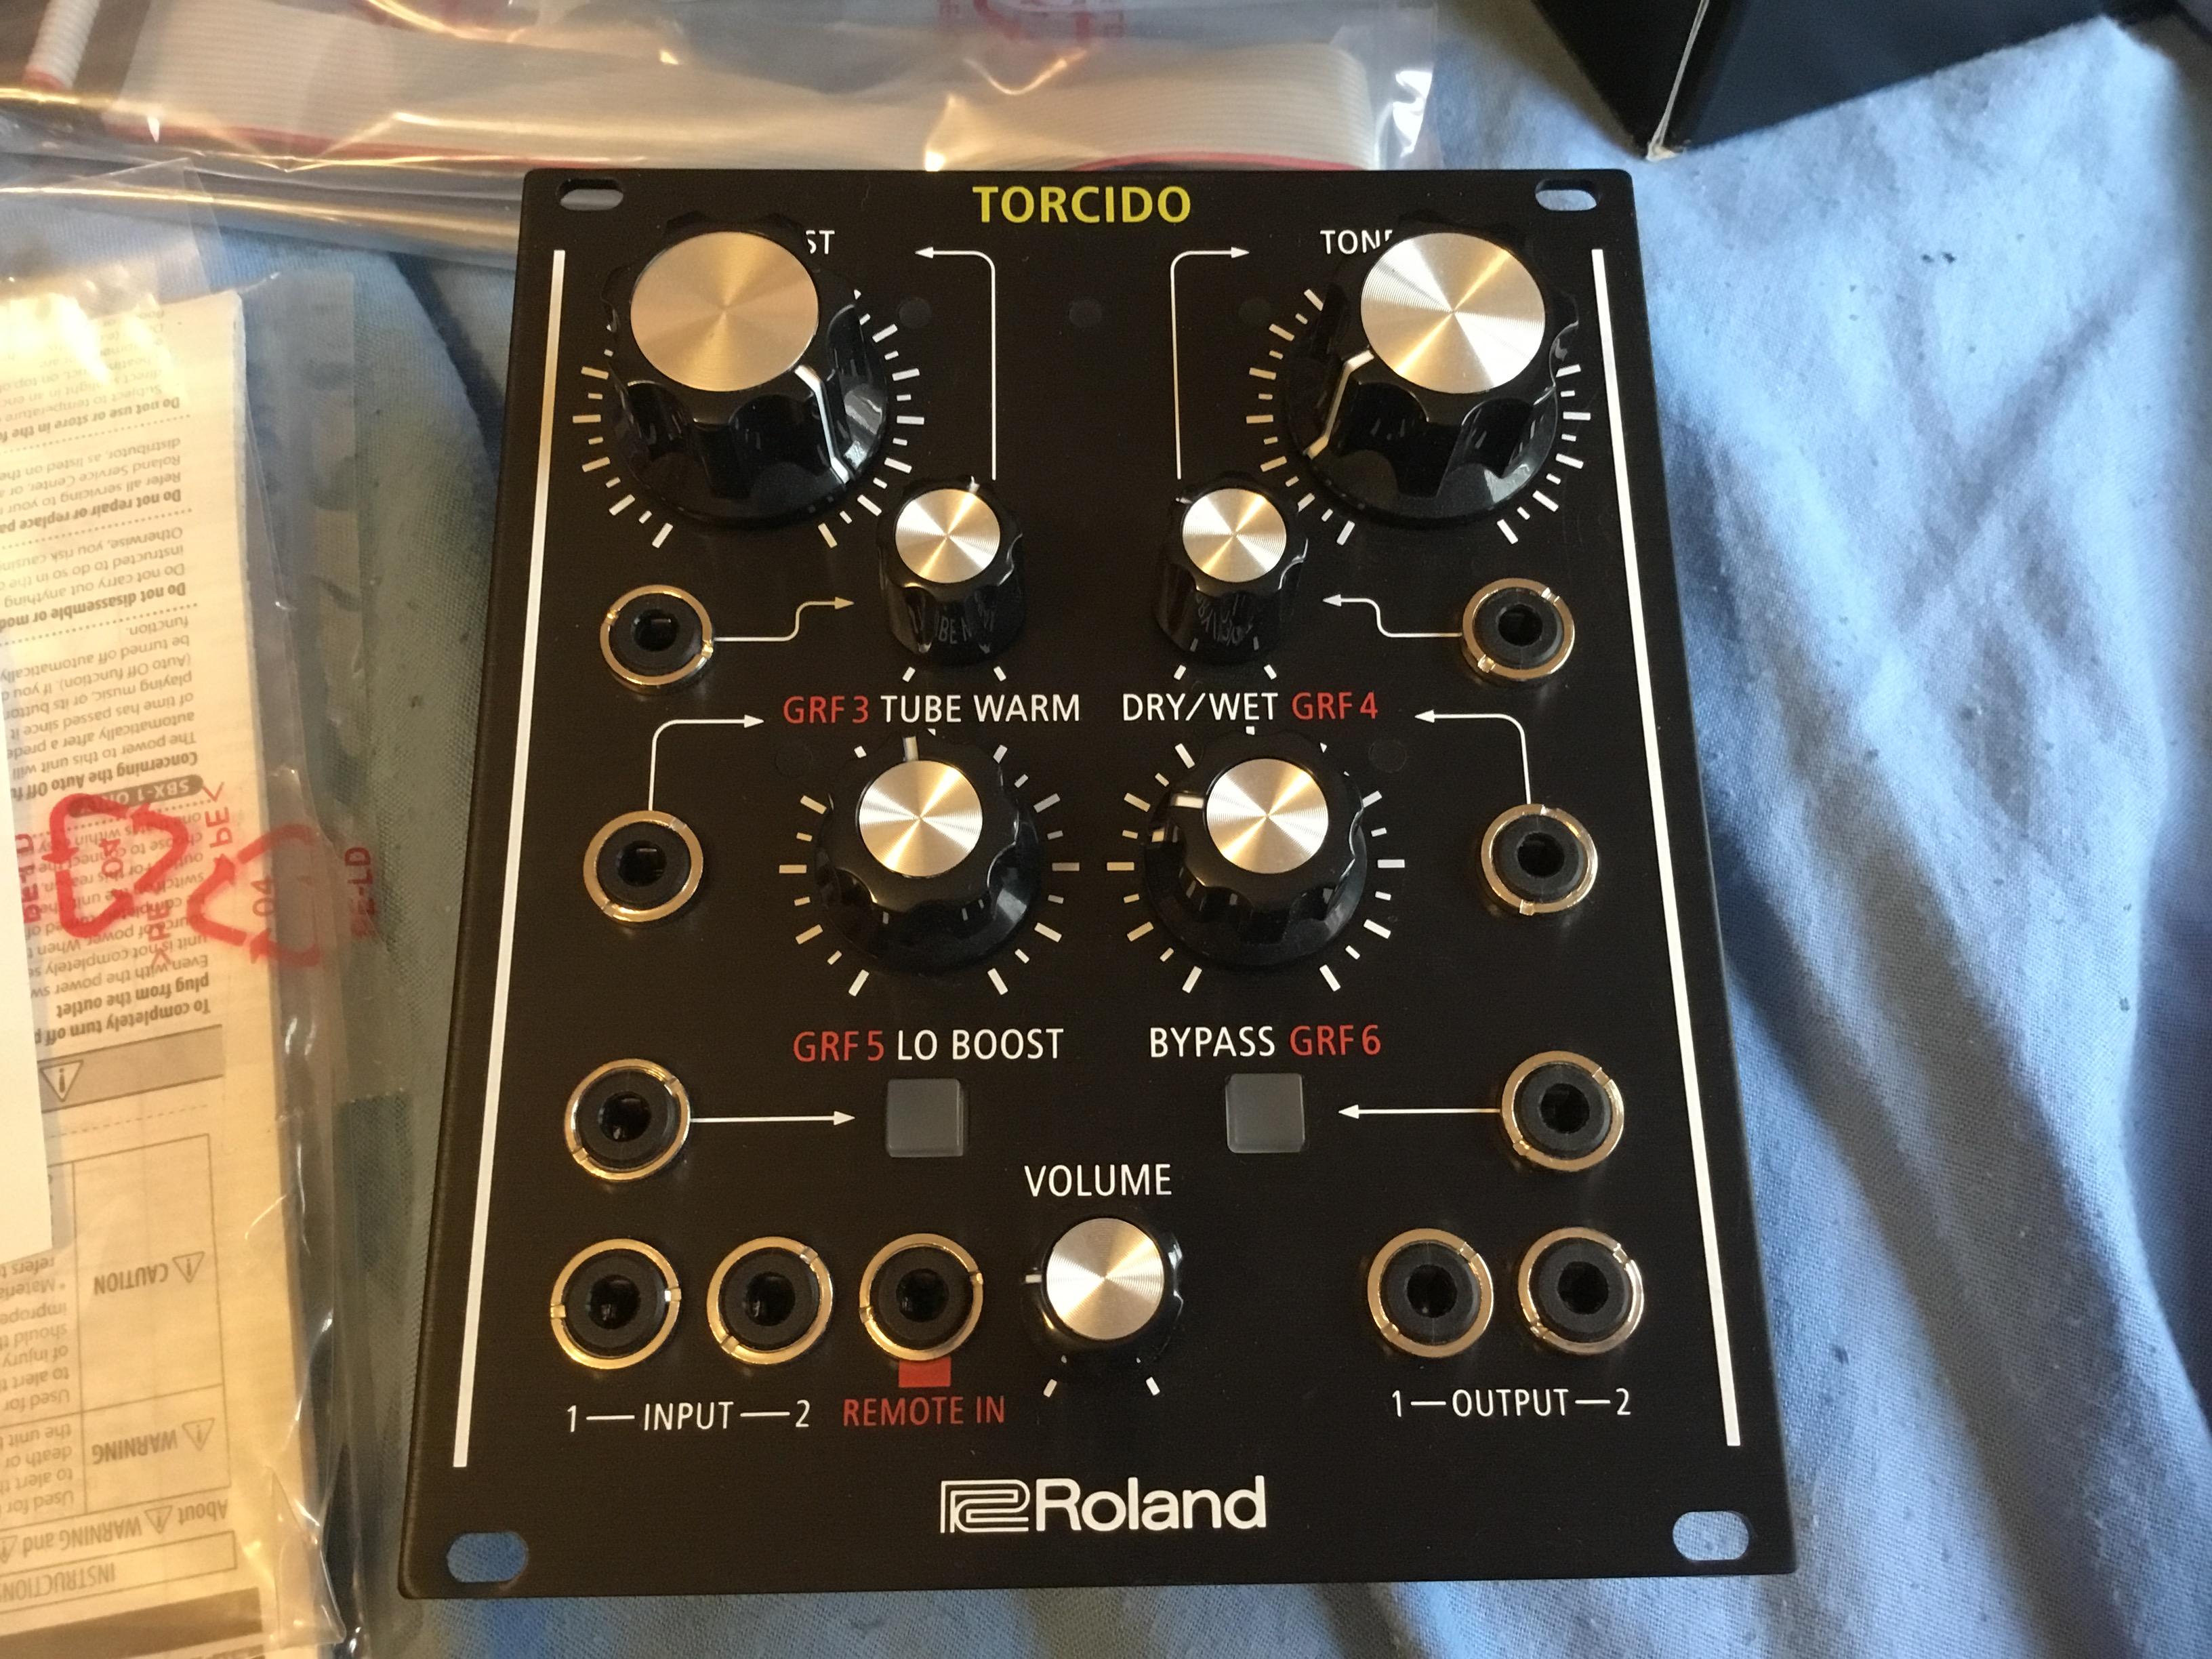 Fs uk : Roland torcido fx - Marketplace - Sell - Elektronauts